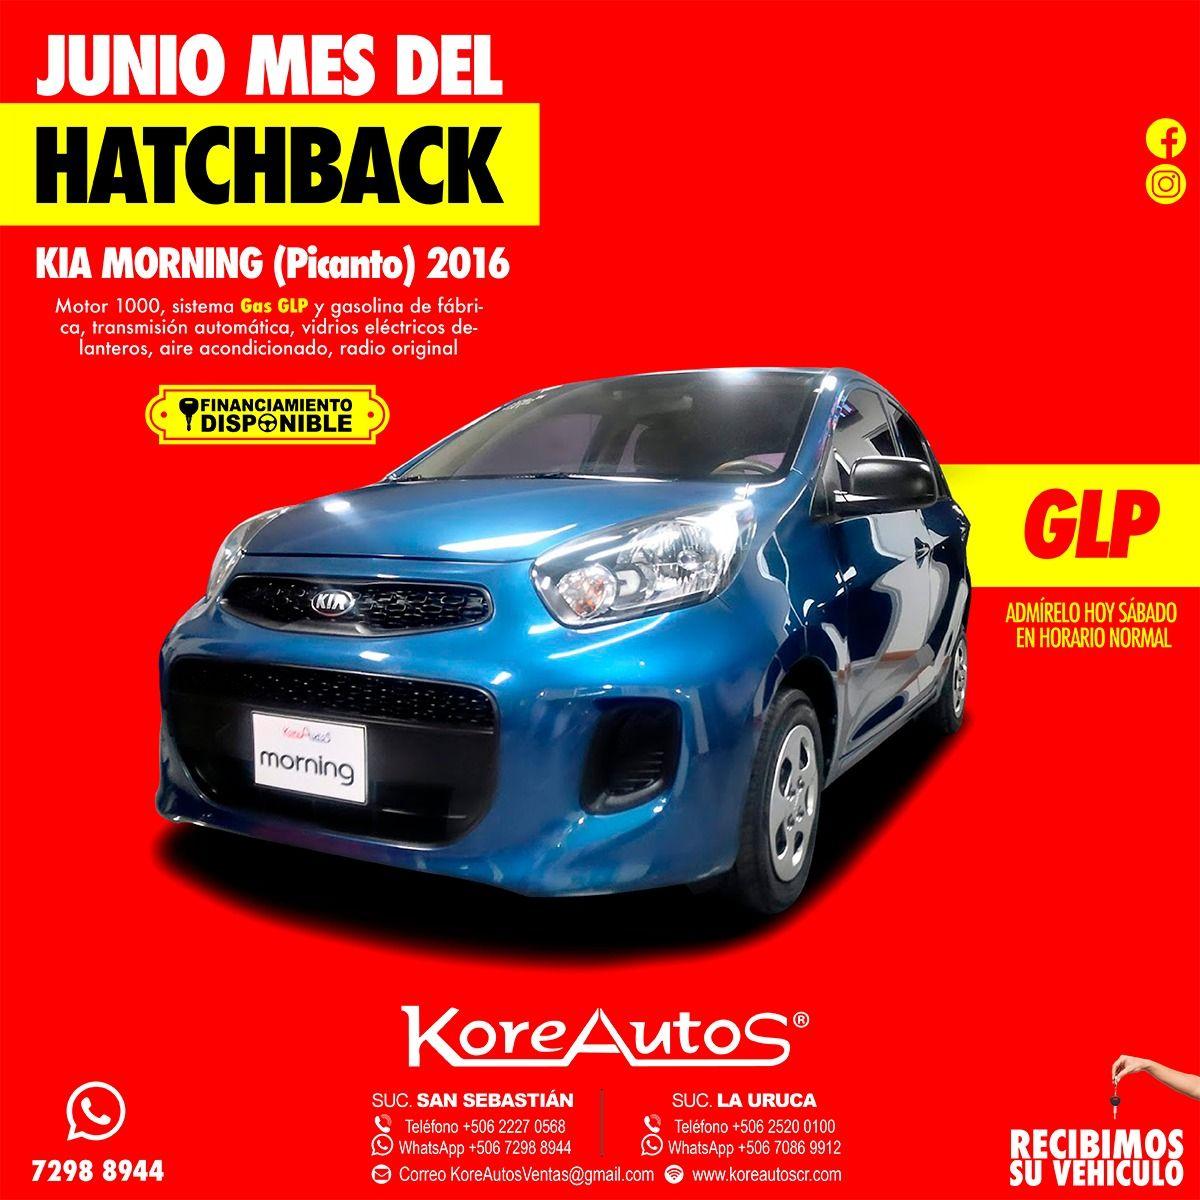 KIA Morning 2016 Kia, Toy car, Sports car